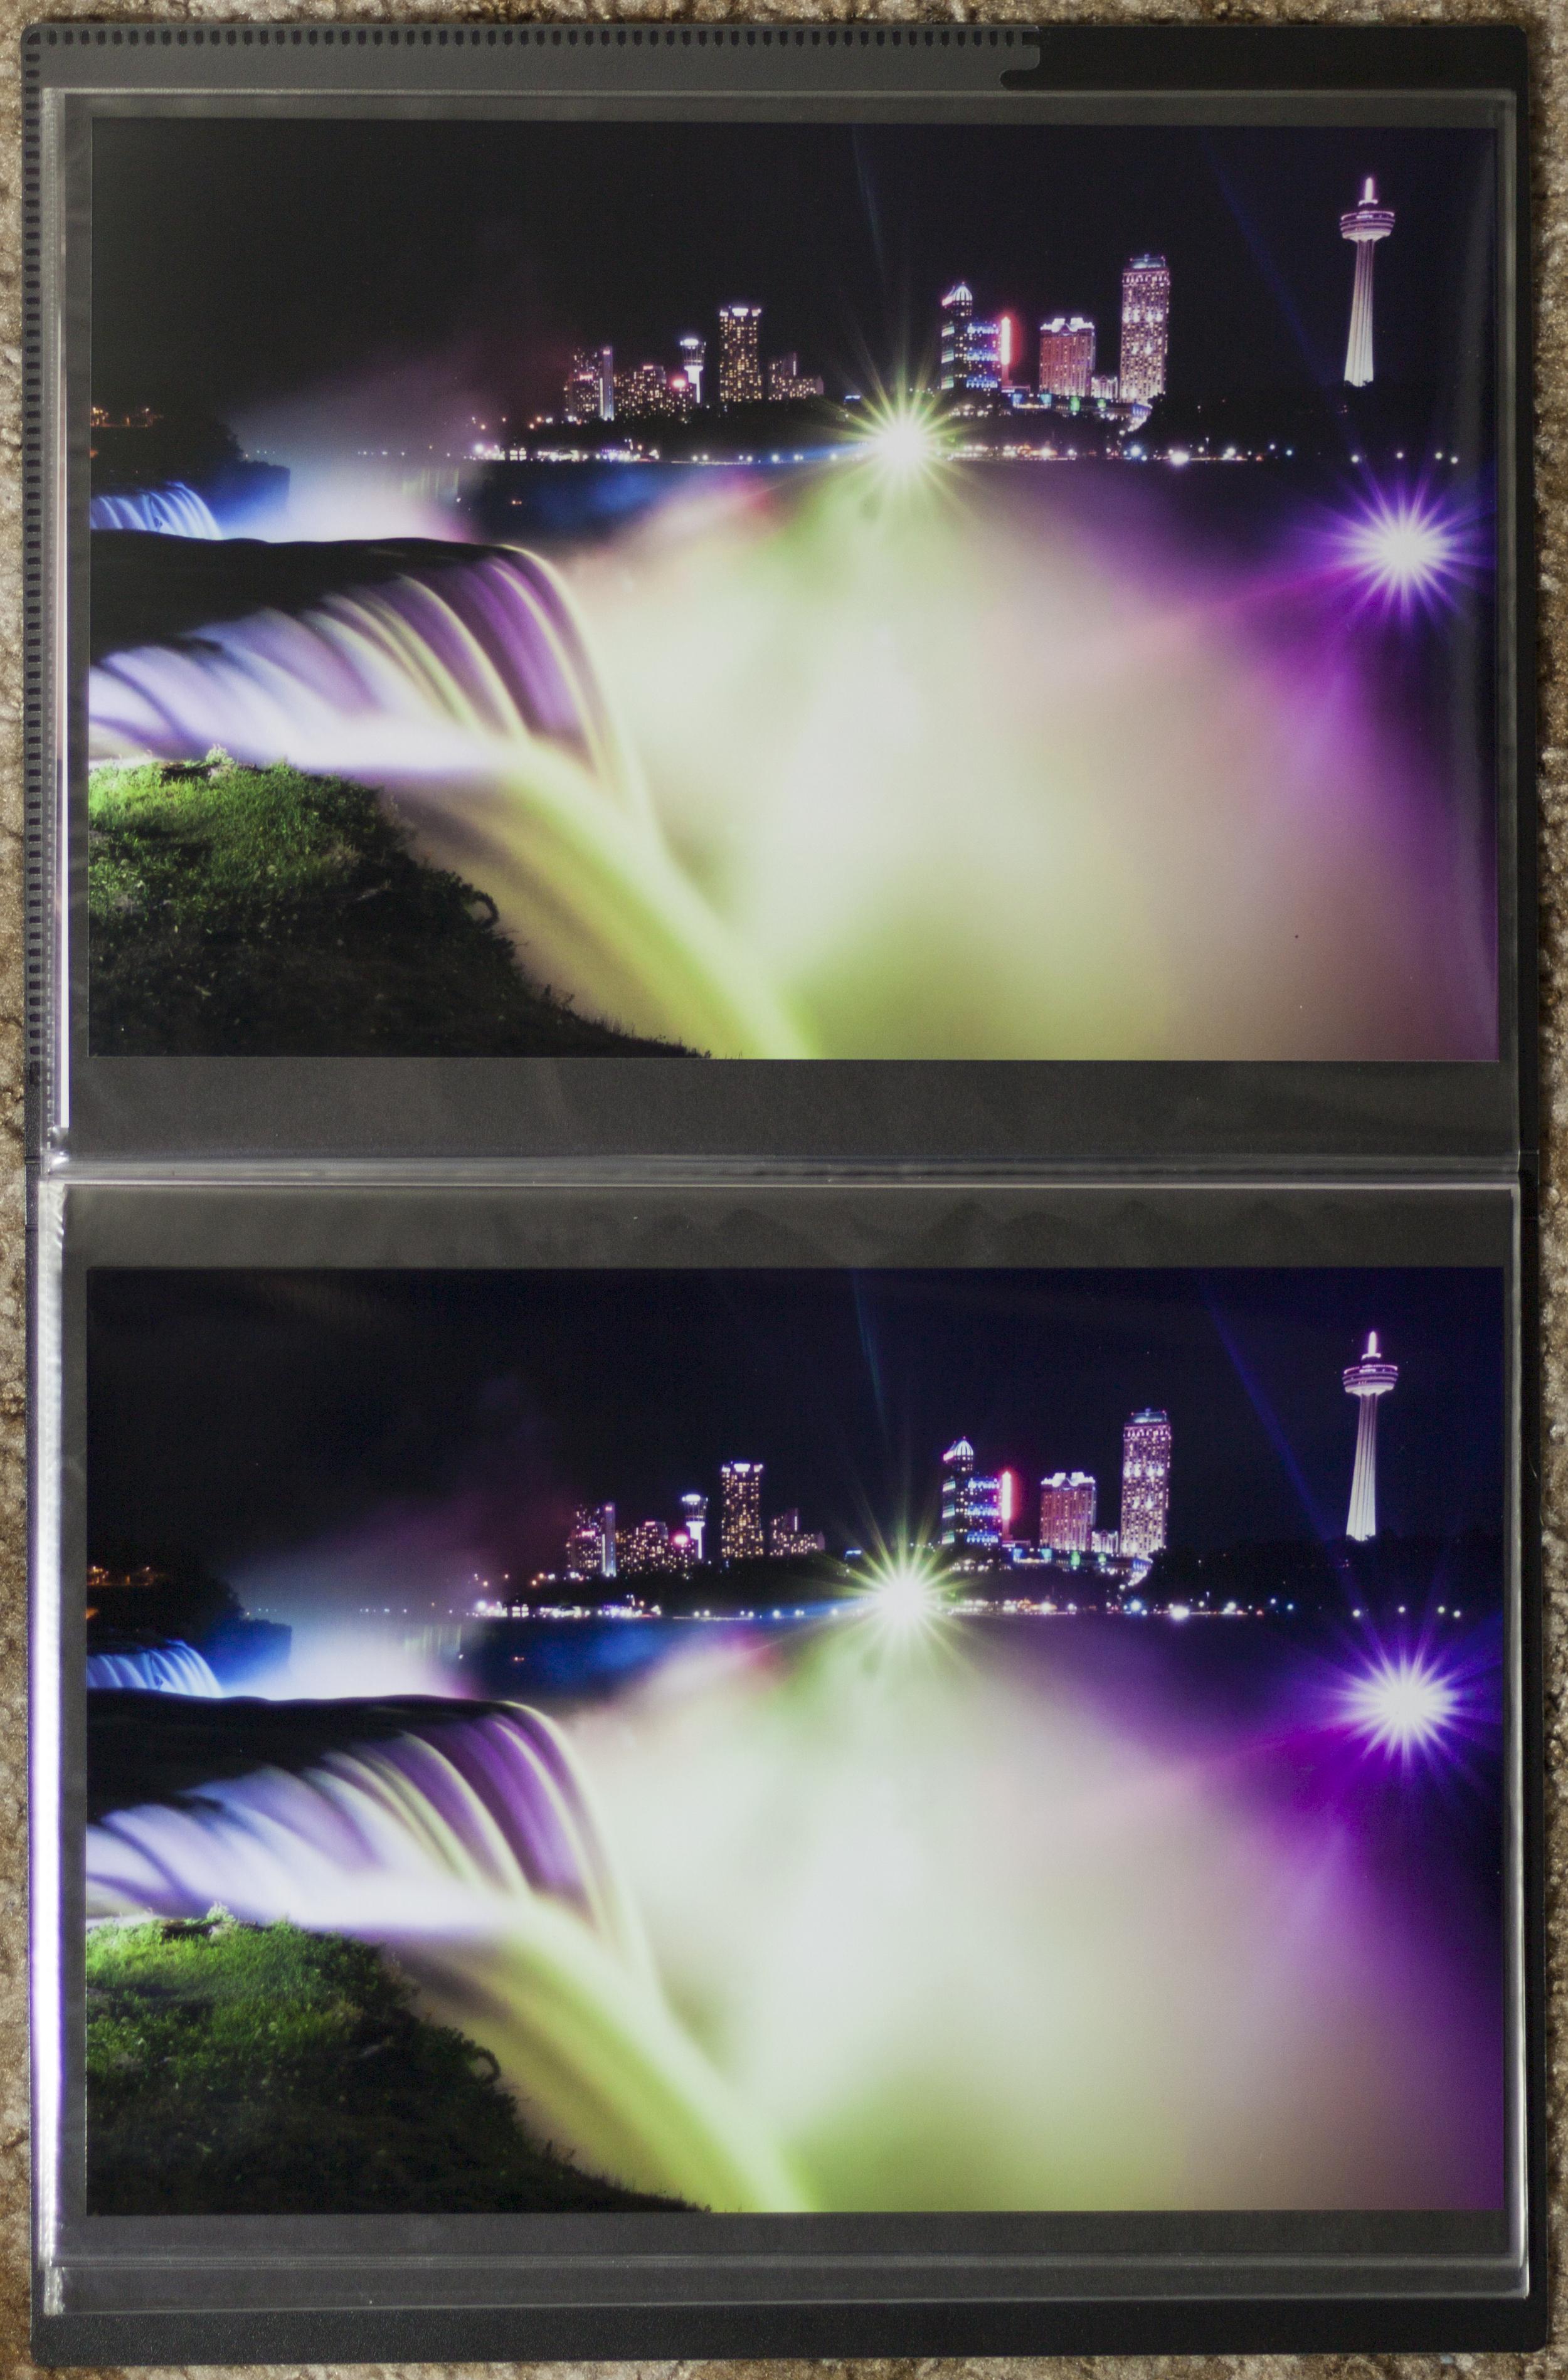 Fuji Pearl on Top. Kodak Endura on Bottom.